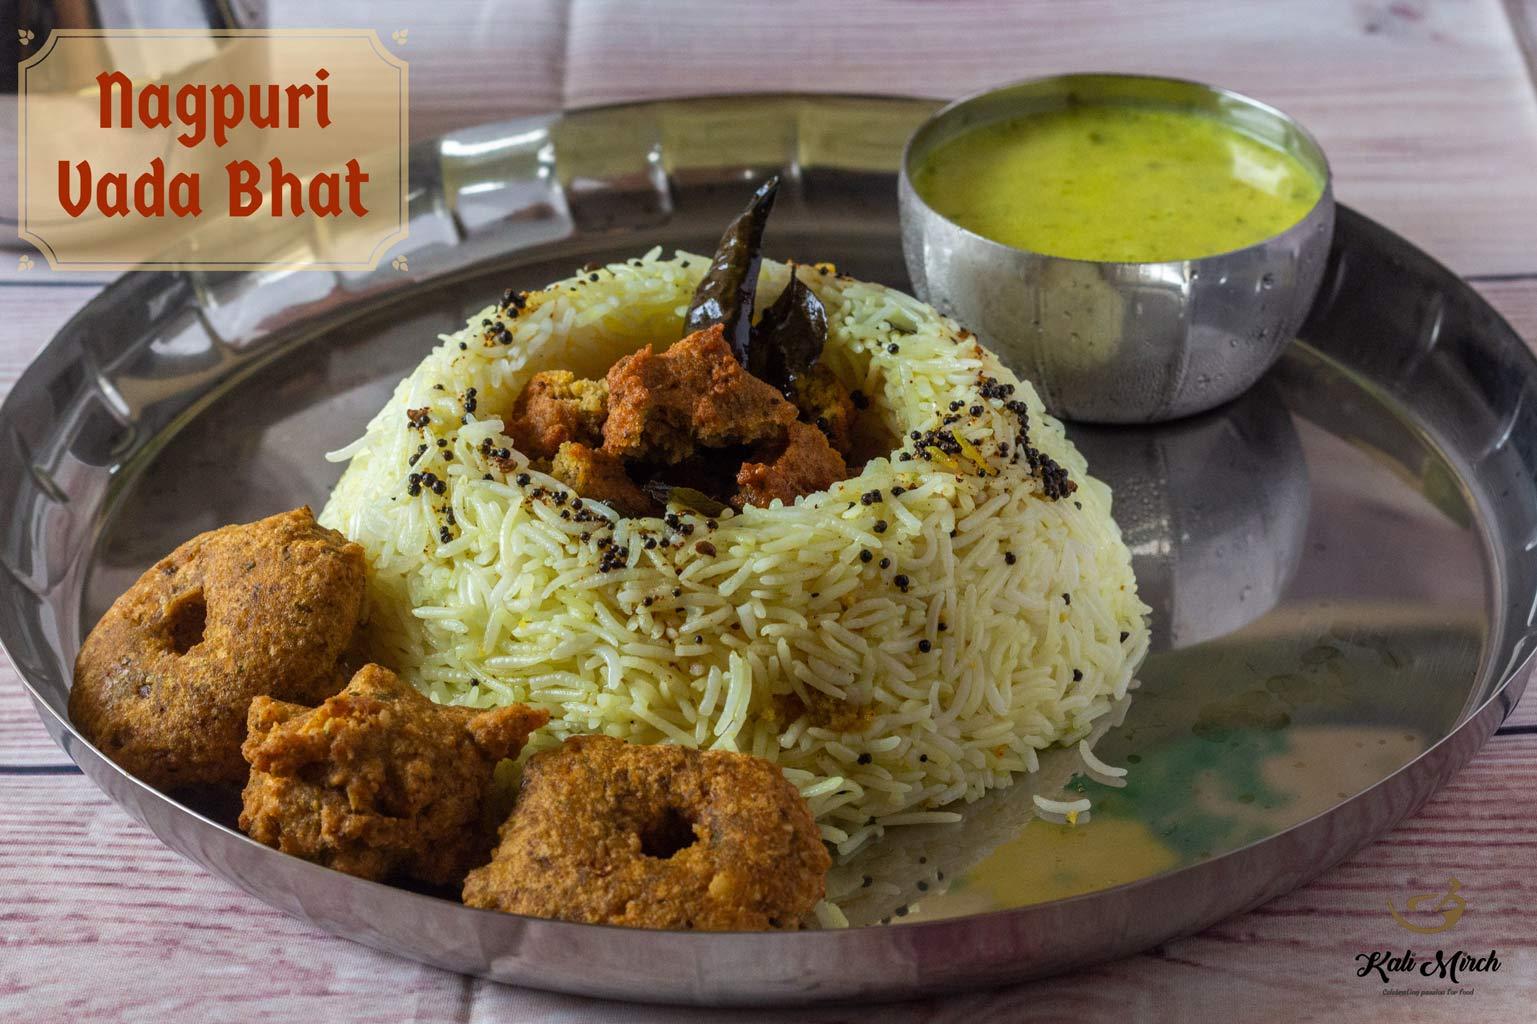 NagPuri Vada Bhat